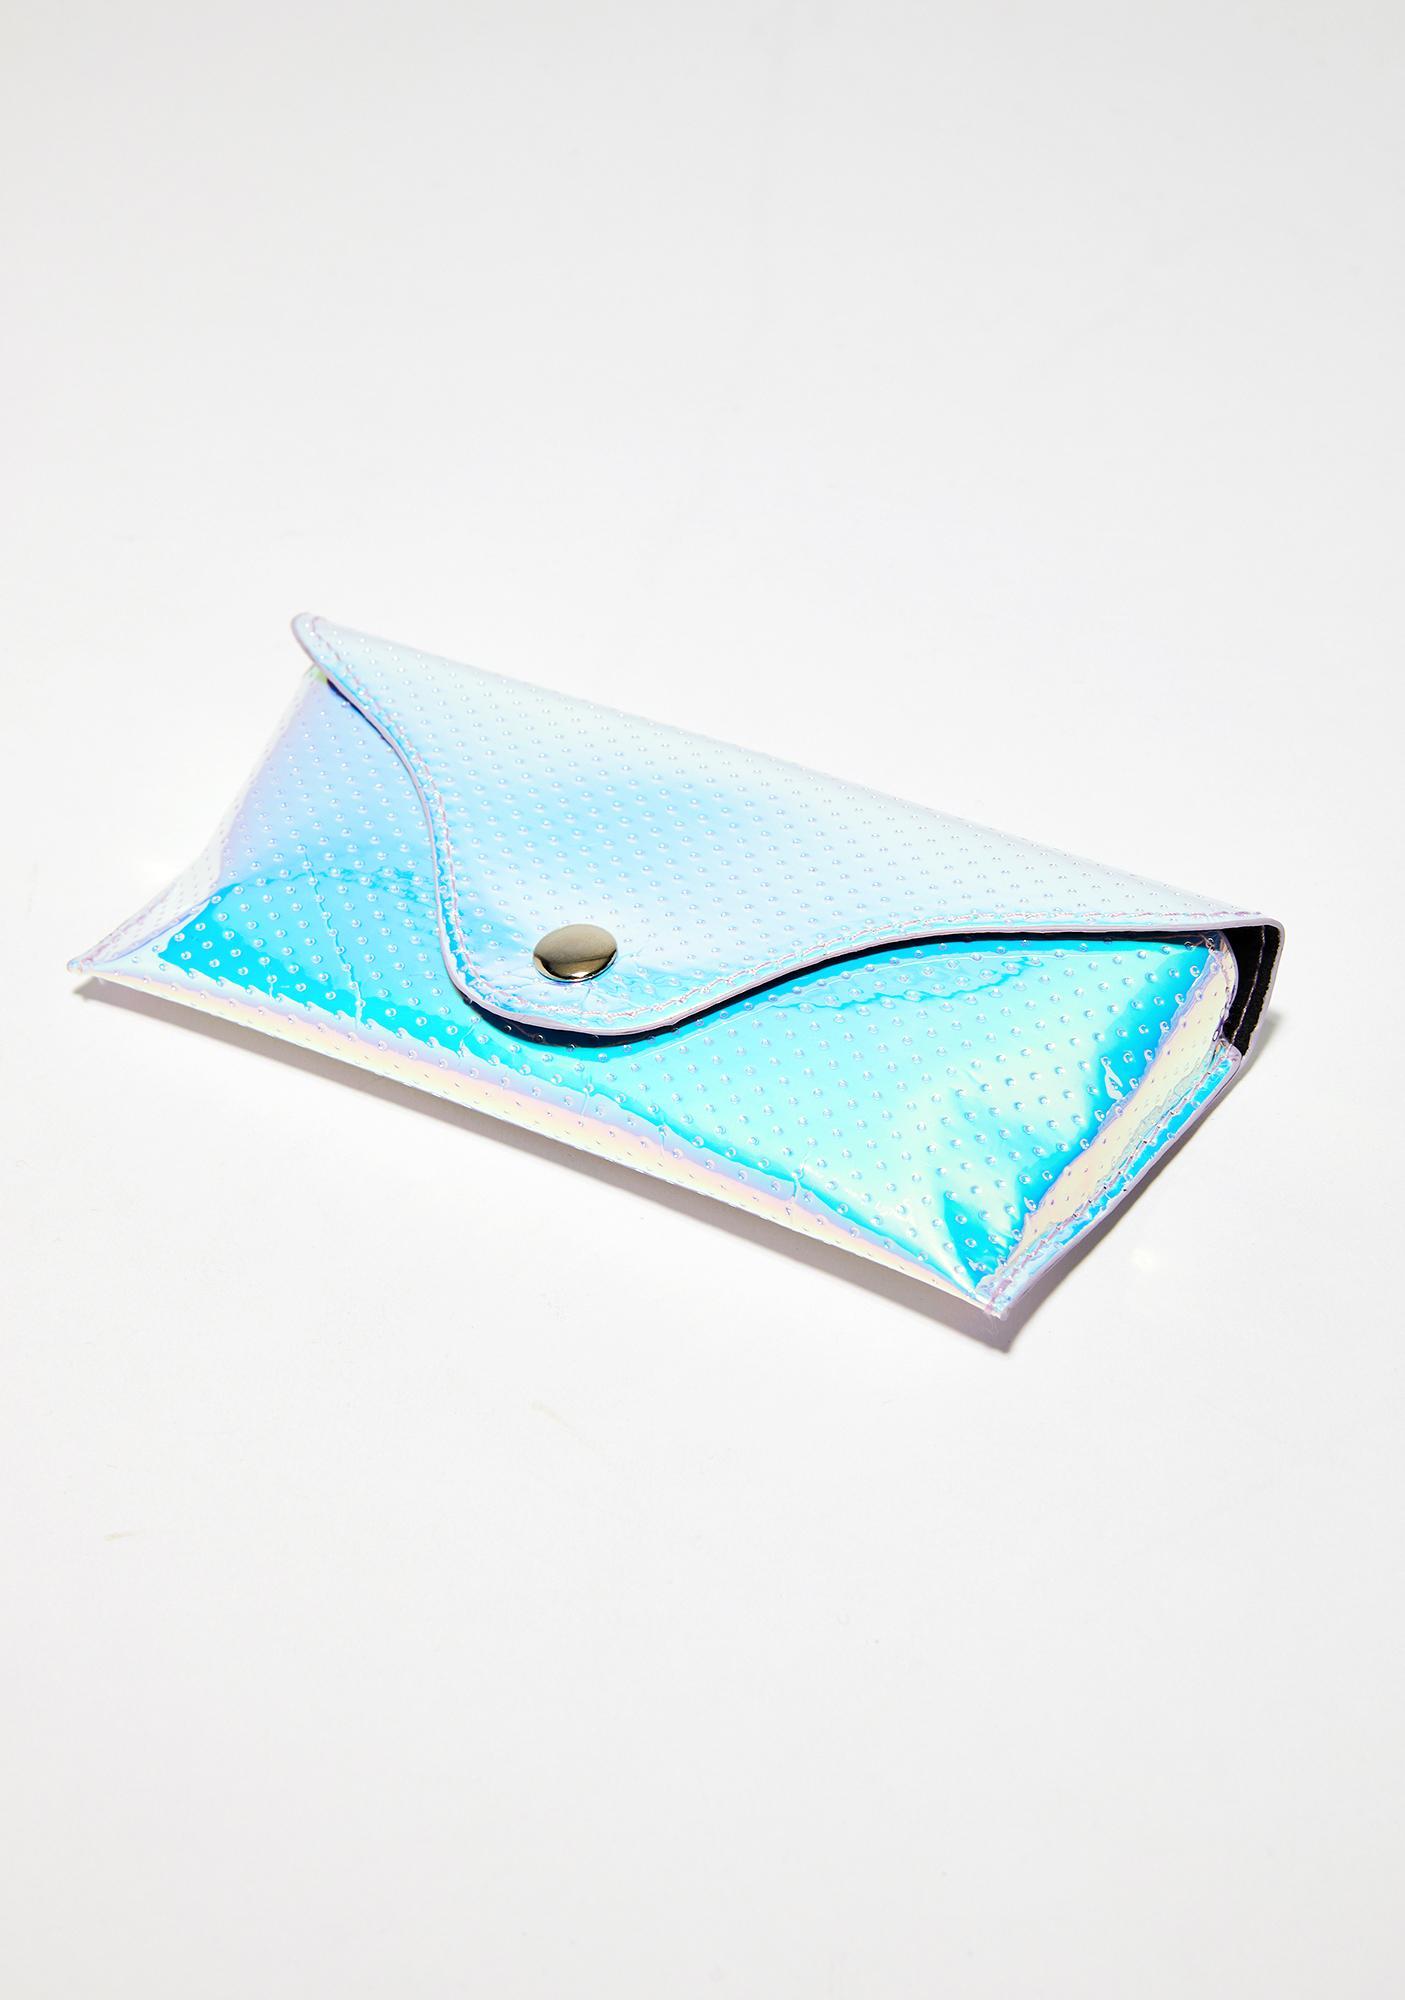 Skinnydip Hologram Sunglasses Pouch